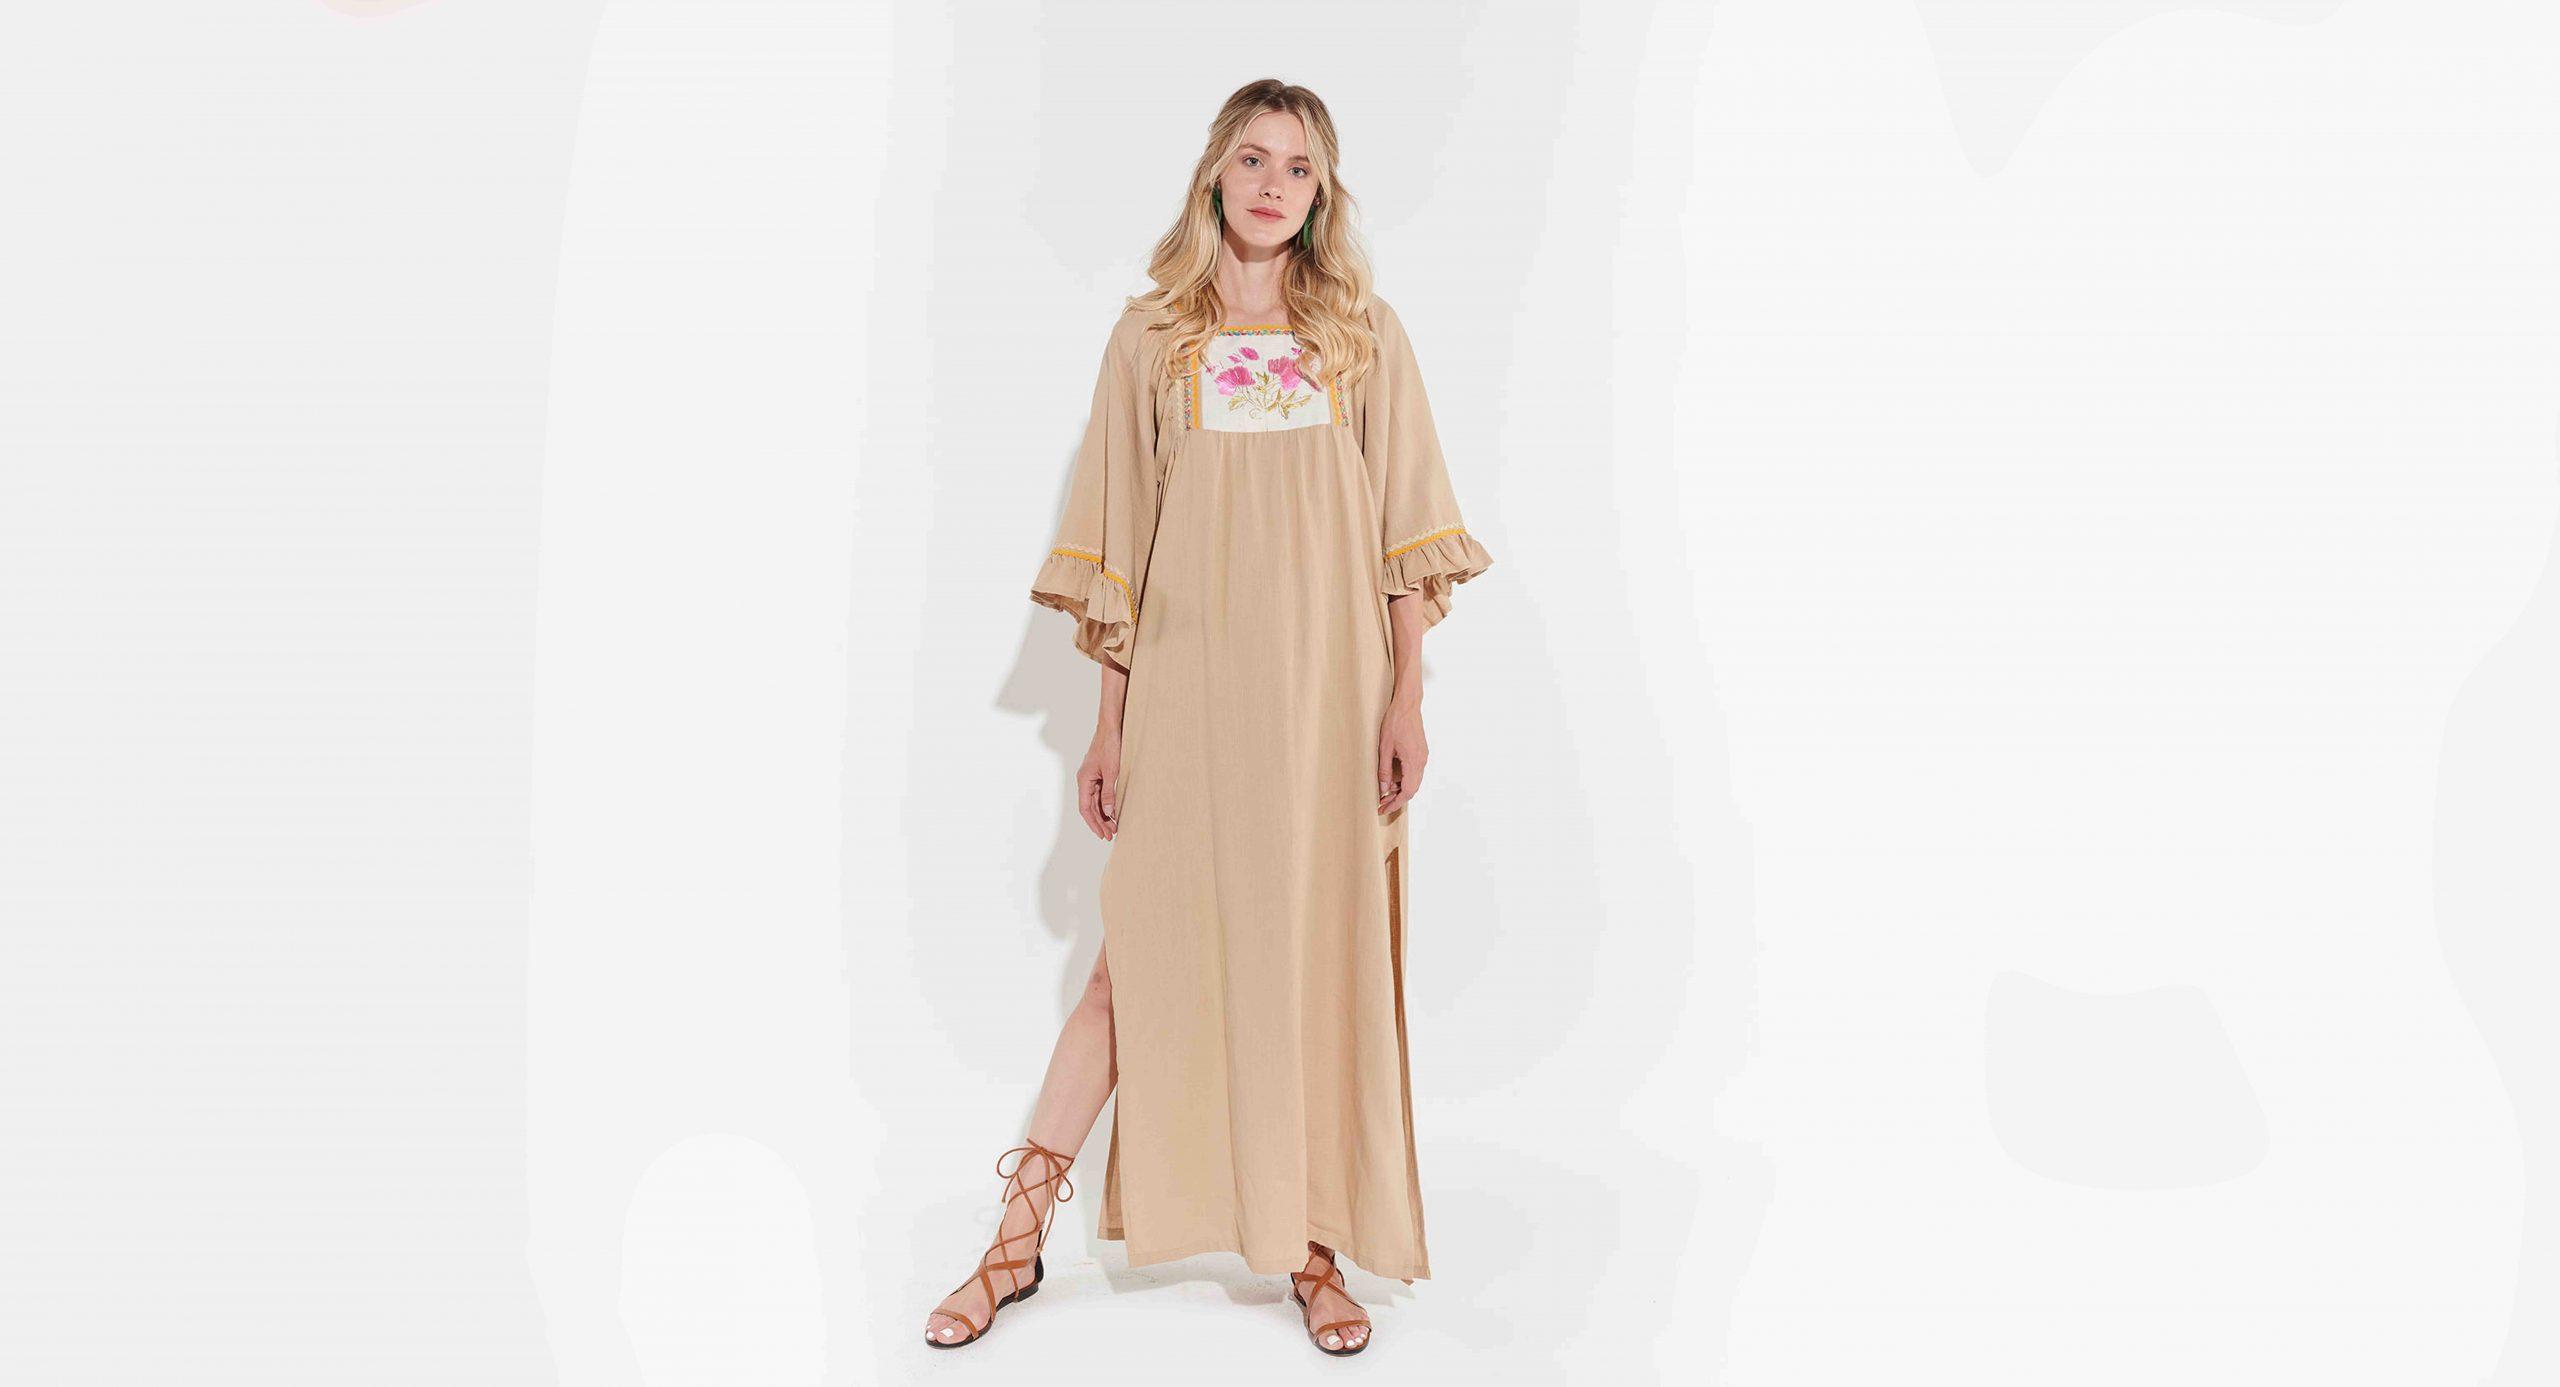 vintage elbise, retro giyim, 70ler retro, bohem etnik elbiseler